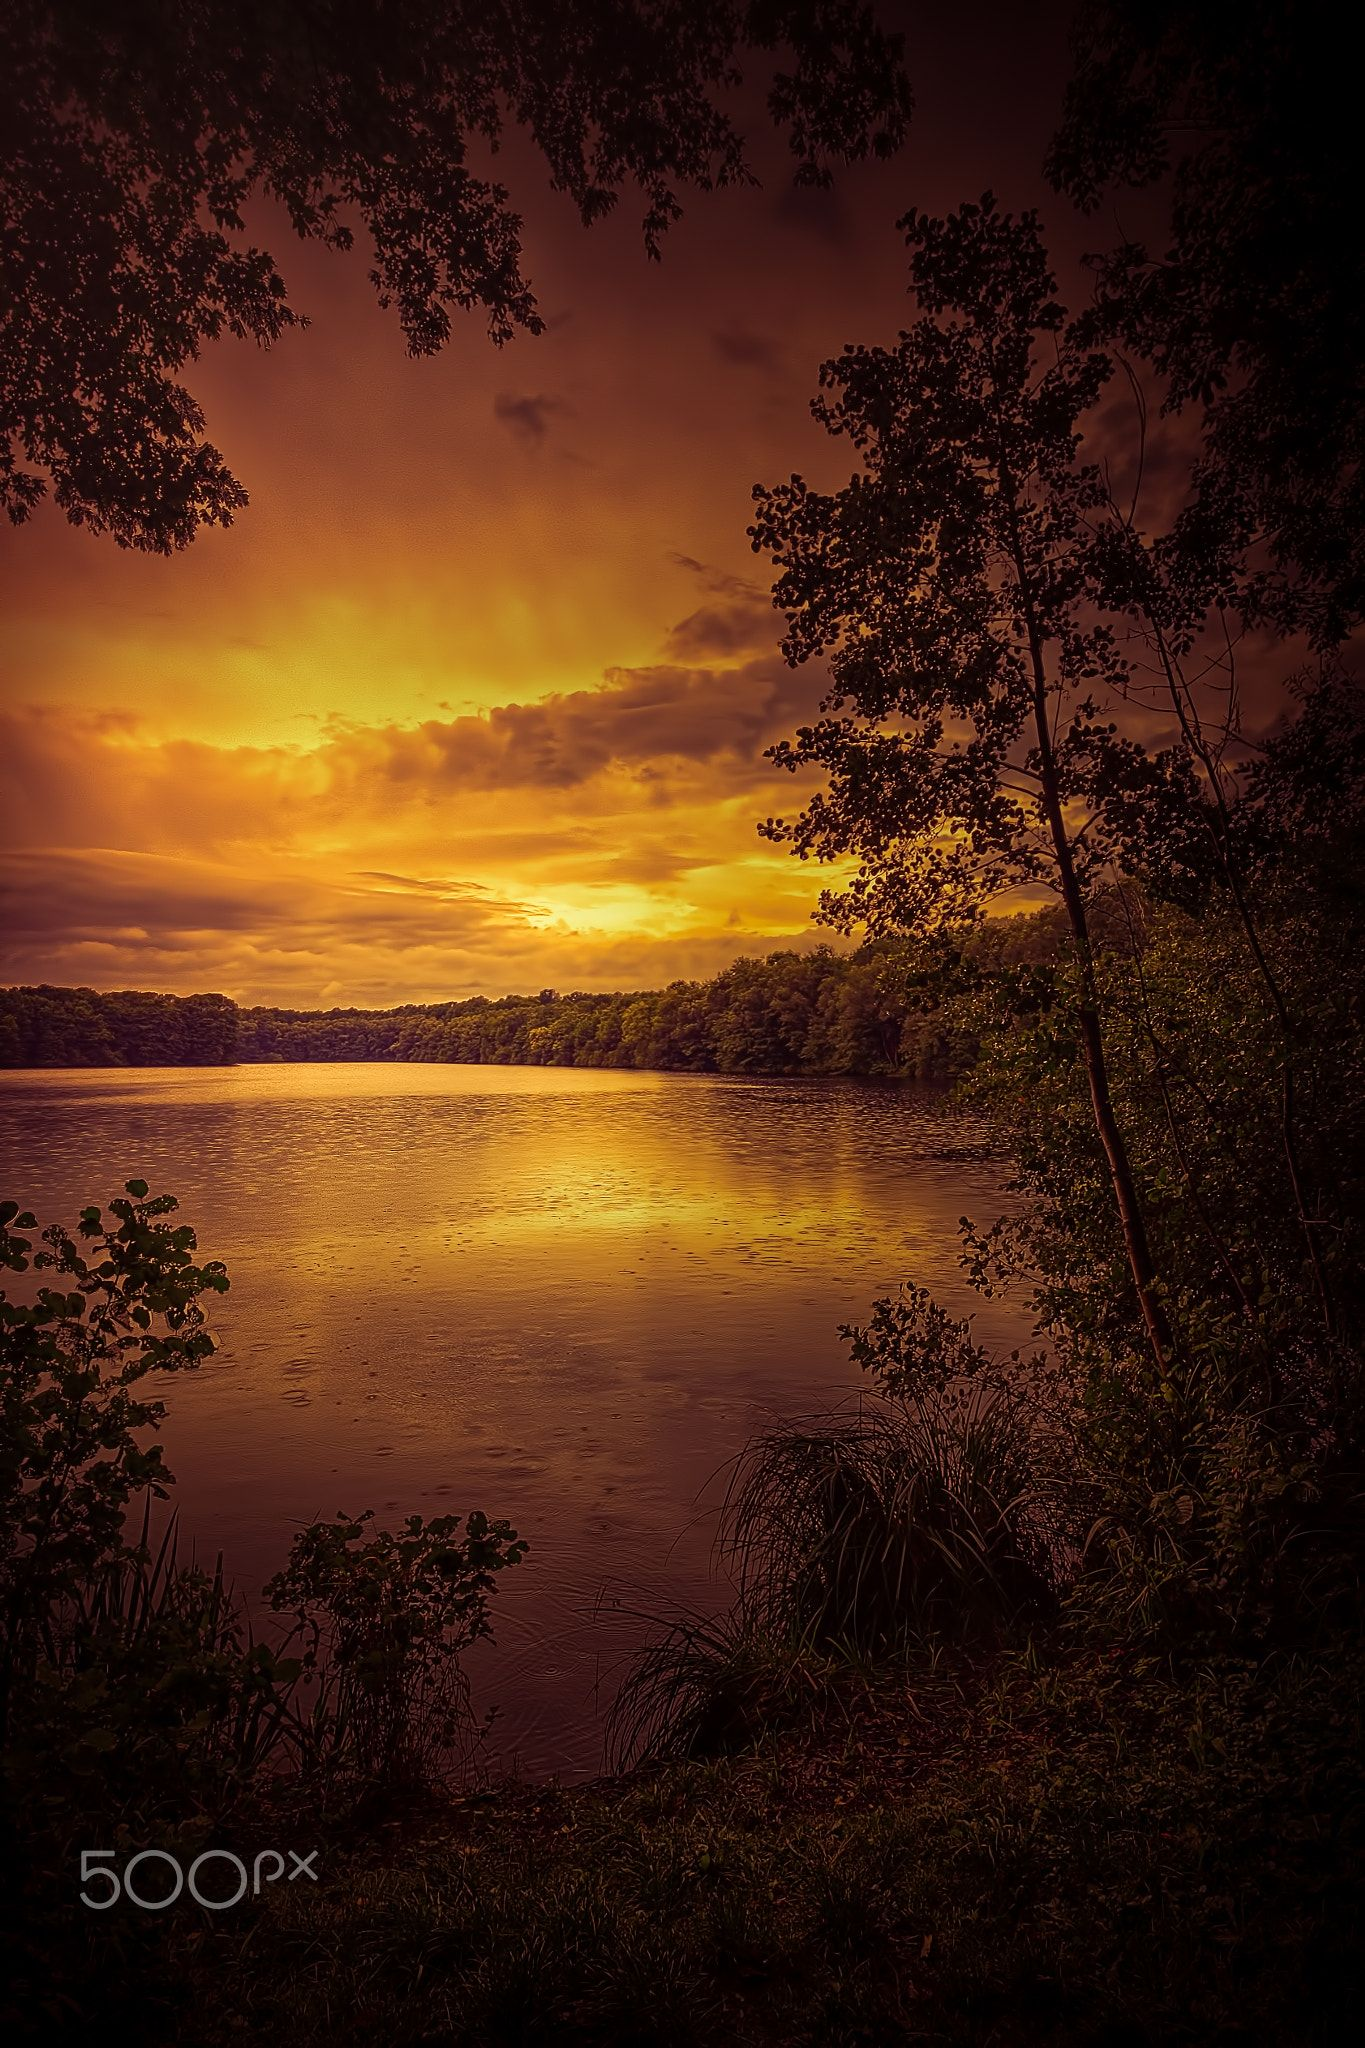 Rain And Sun Null Sunset Landscape Landscape Photography Beautiful Nature